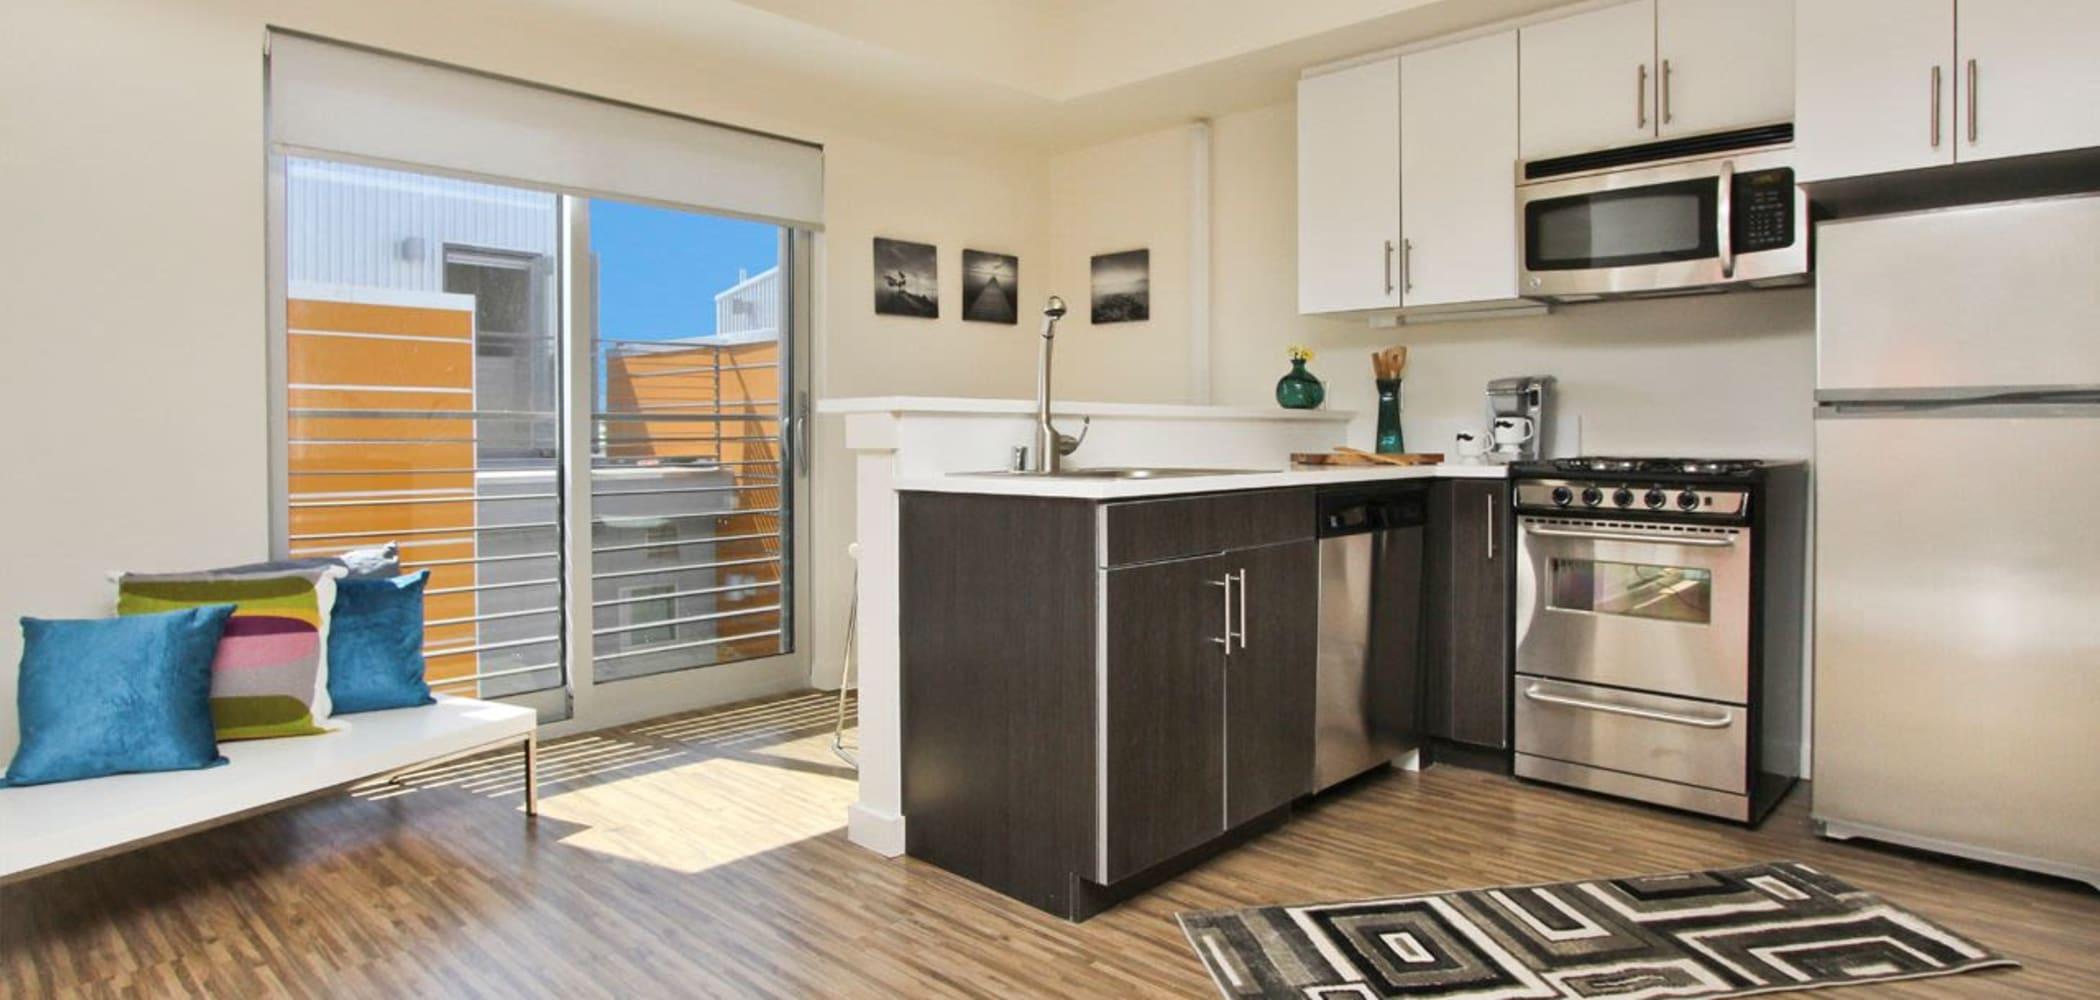 Sleek, modern kitchen at ICON in Isla Vista, California